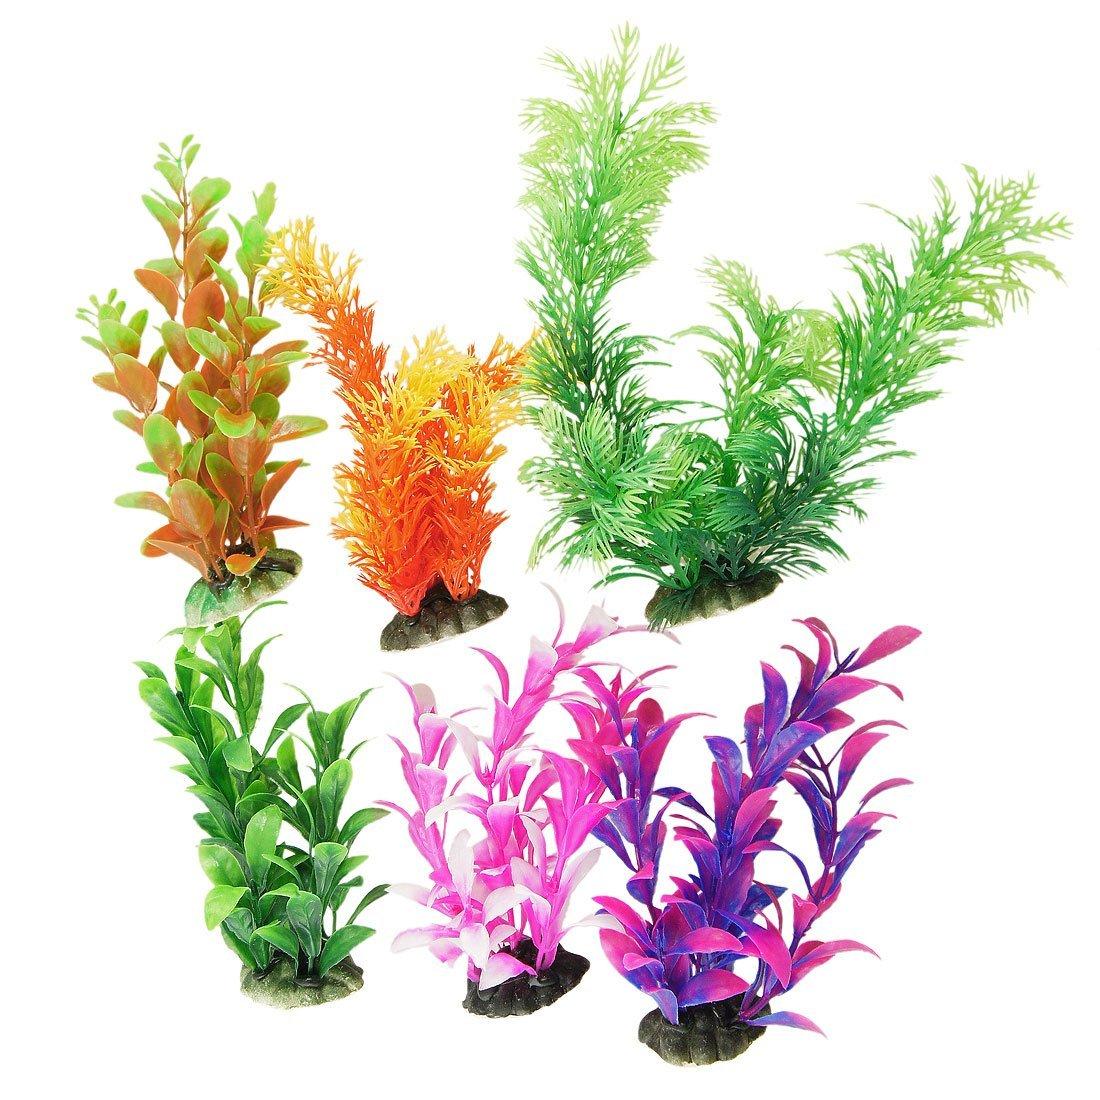 Dragon fish tank ornament - Colorful Fish Tank